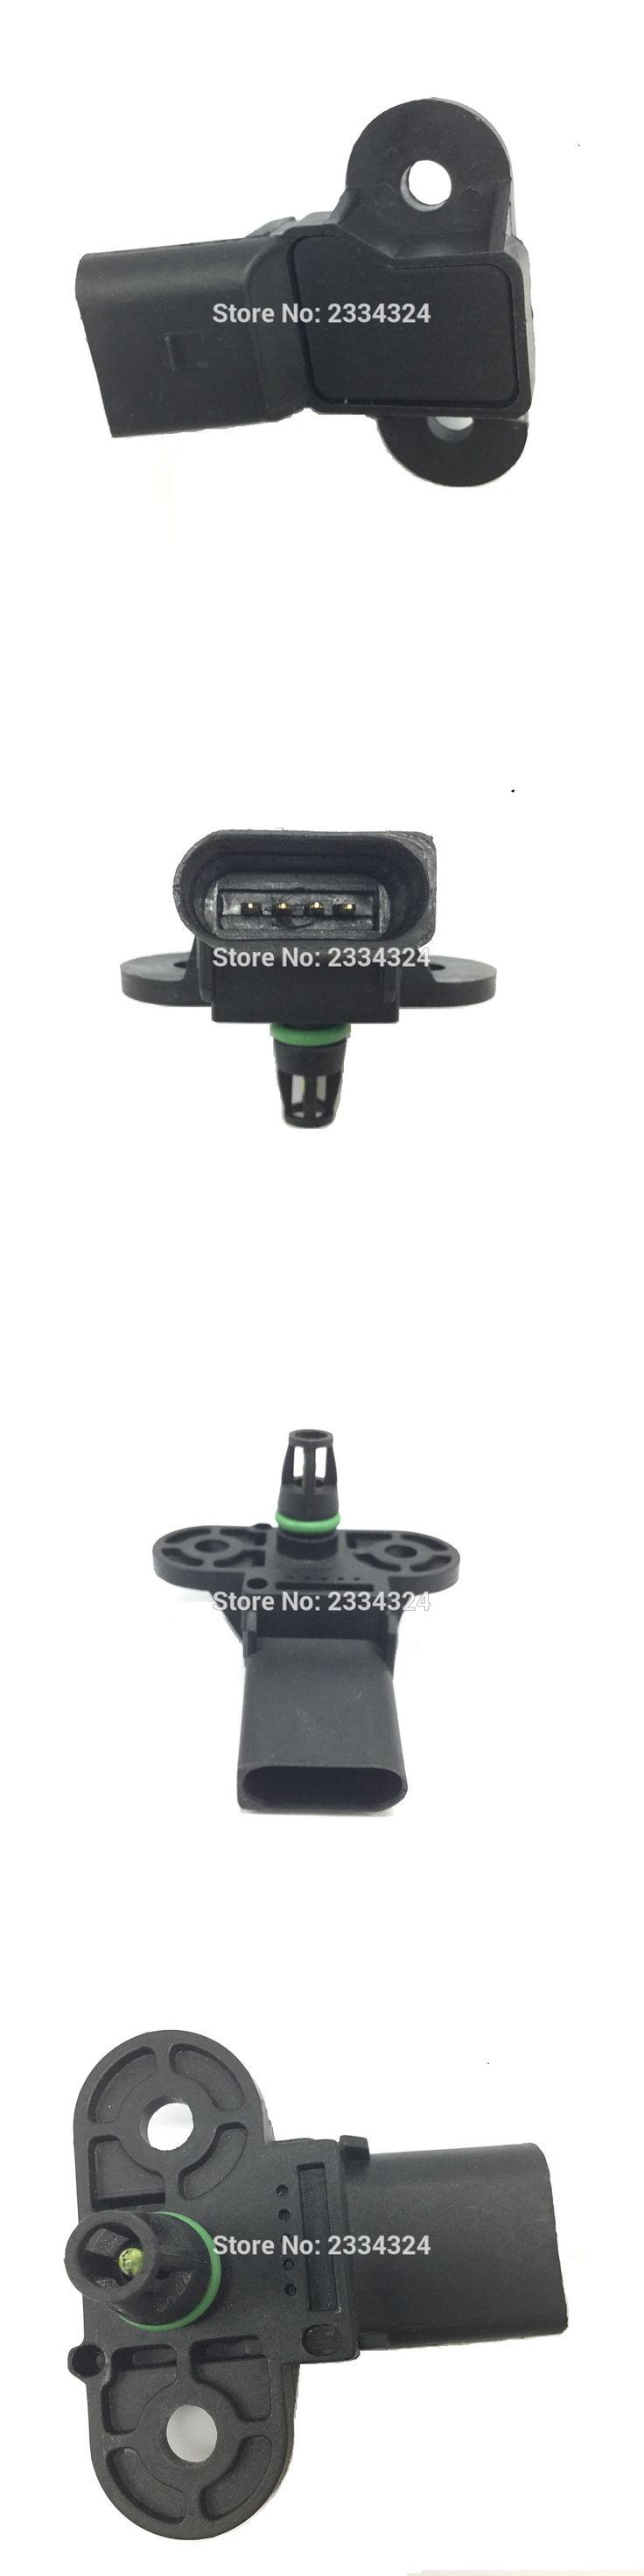 MAP Intake Air Pressure Sensor For AUDI A3 VW Beetle Bora Caddy Eos Golf Jetta Lupo Passat Polo Touran 1.2 1.4 1.6 2.0 06B906051